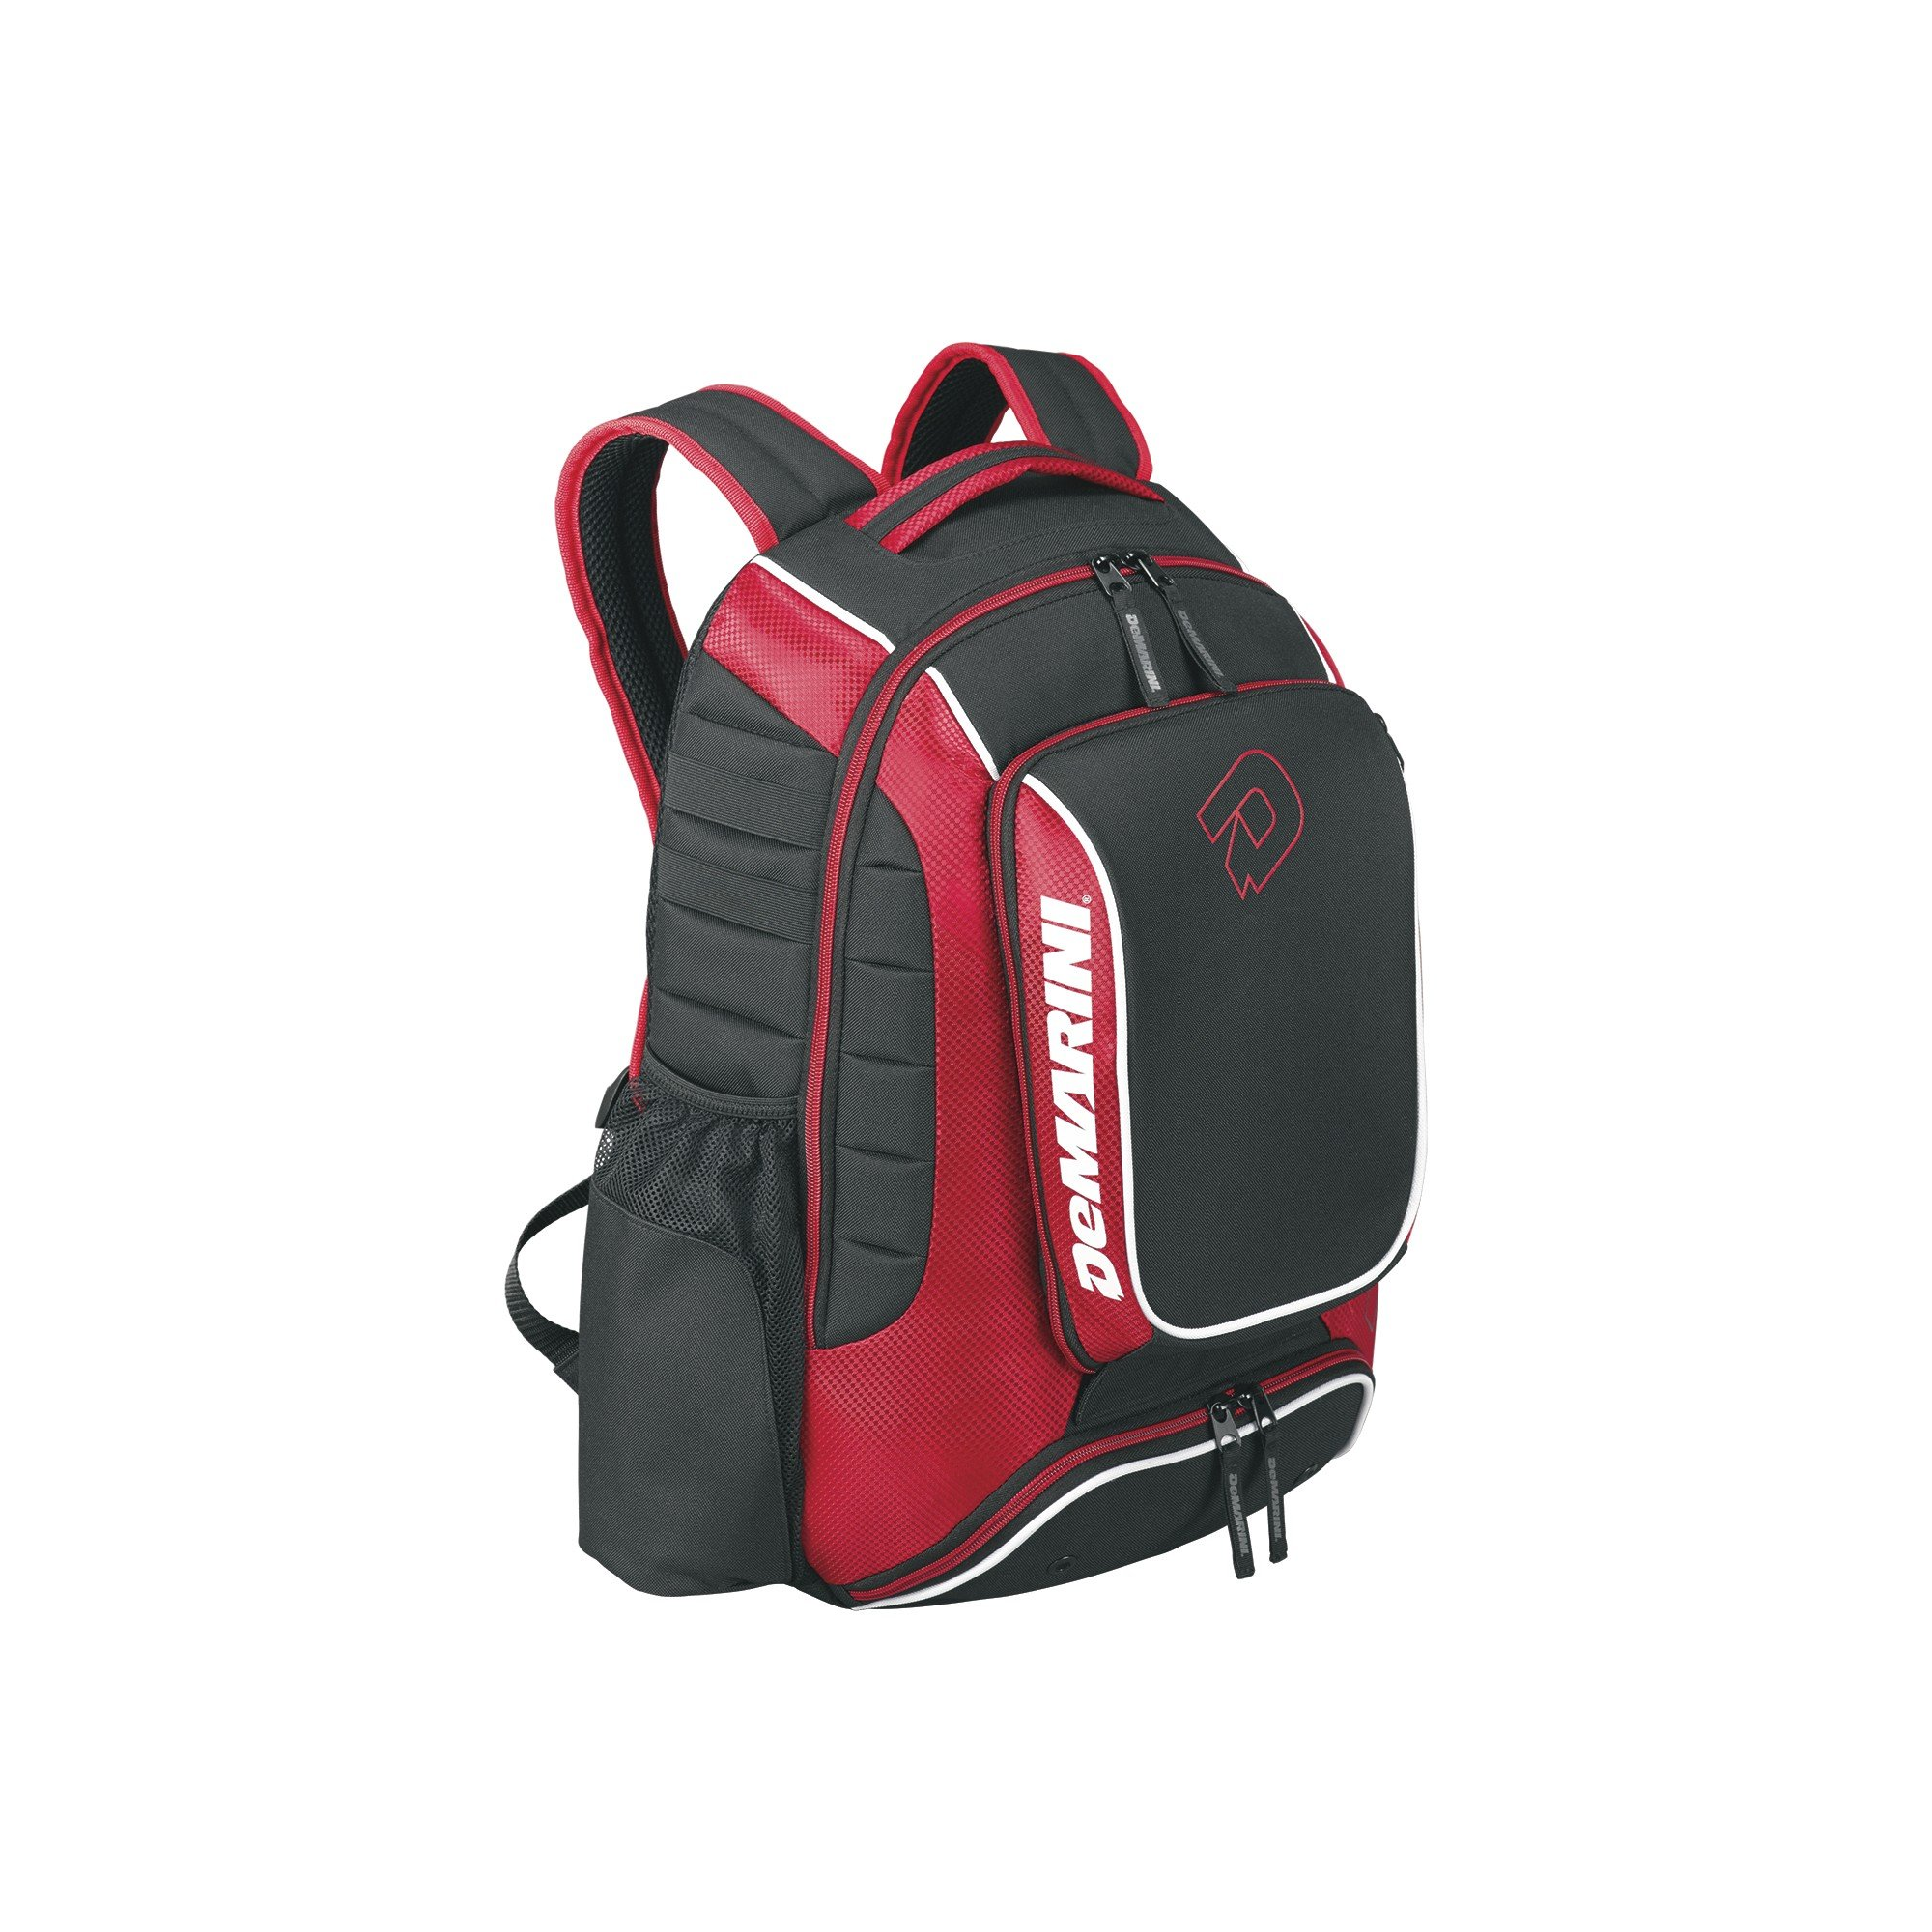 DeMarini WTD9407SC Momentum Backpack, Scarlet by DeMarini (Image #1)